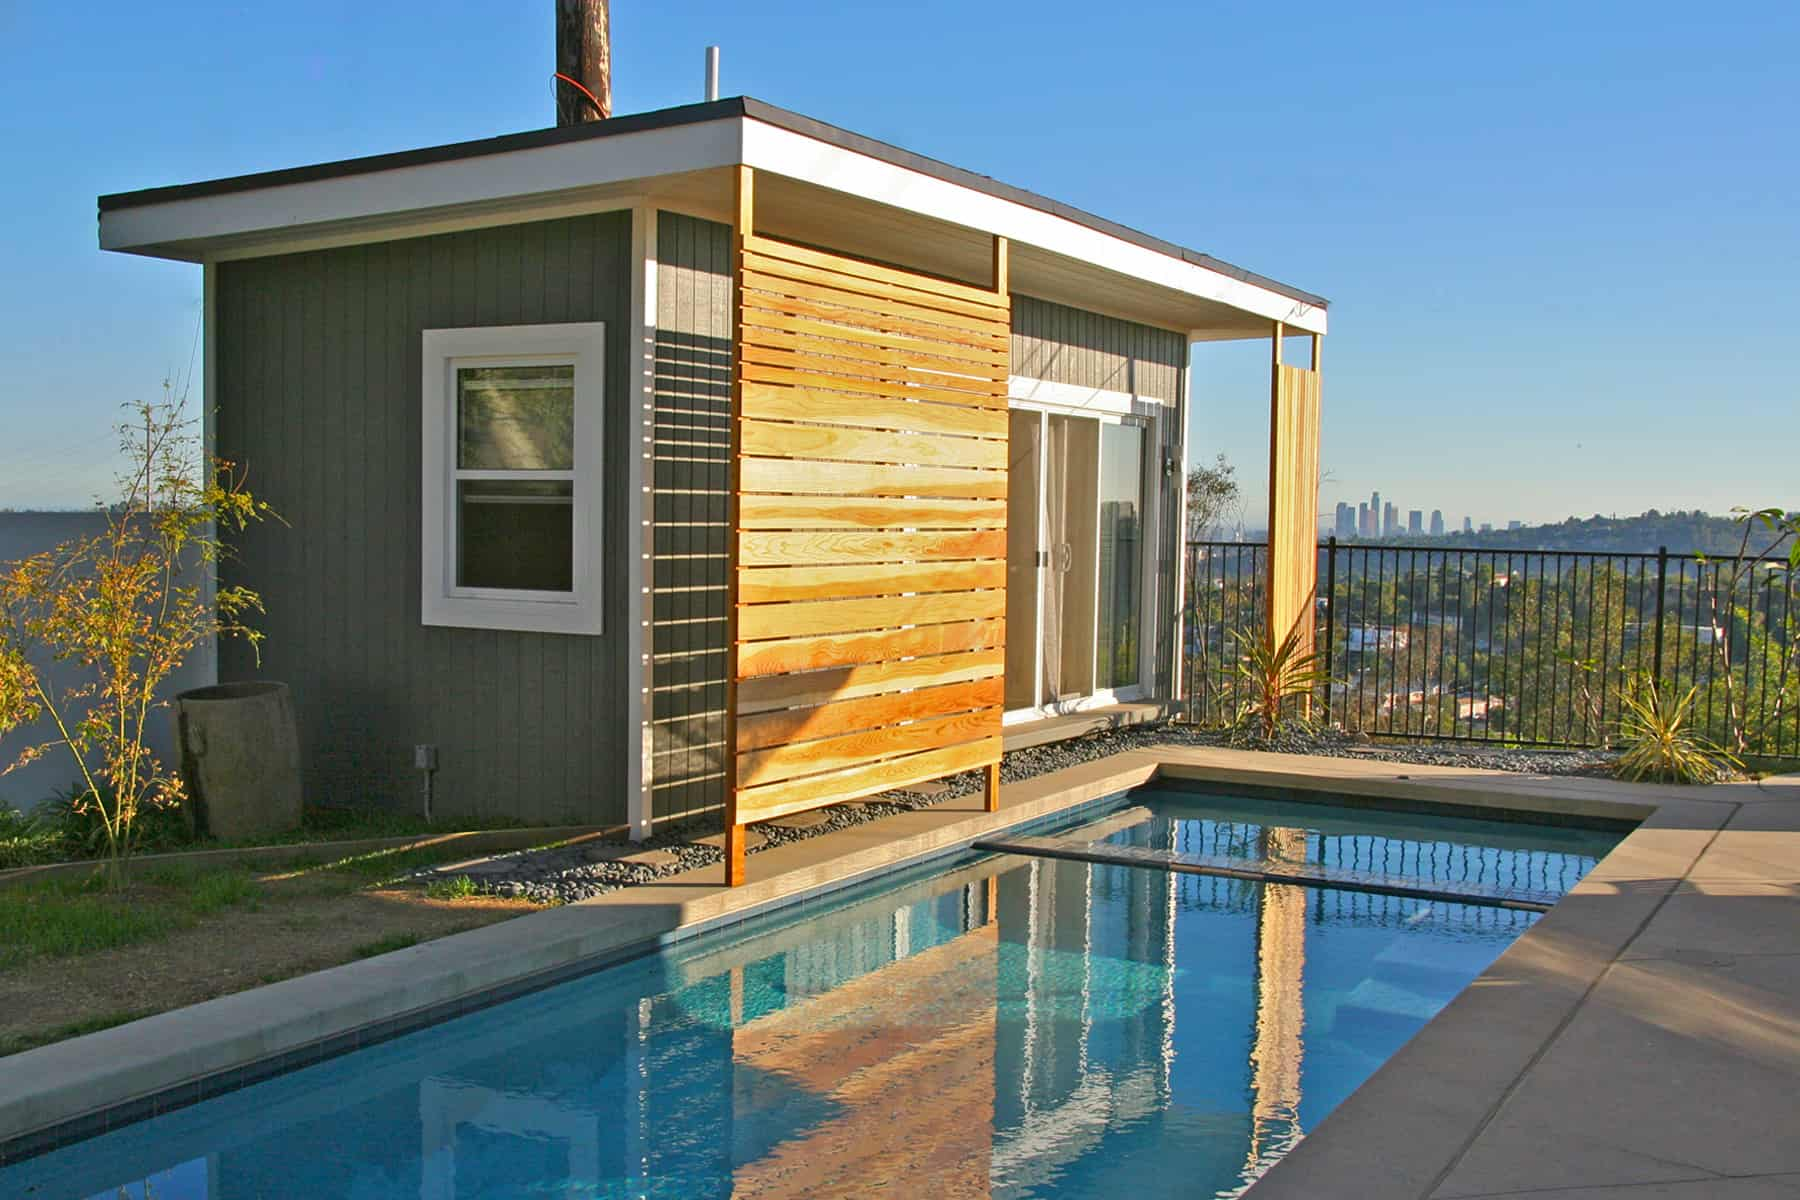 The Modern Verana Pool House - Summerwood Products